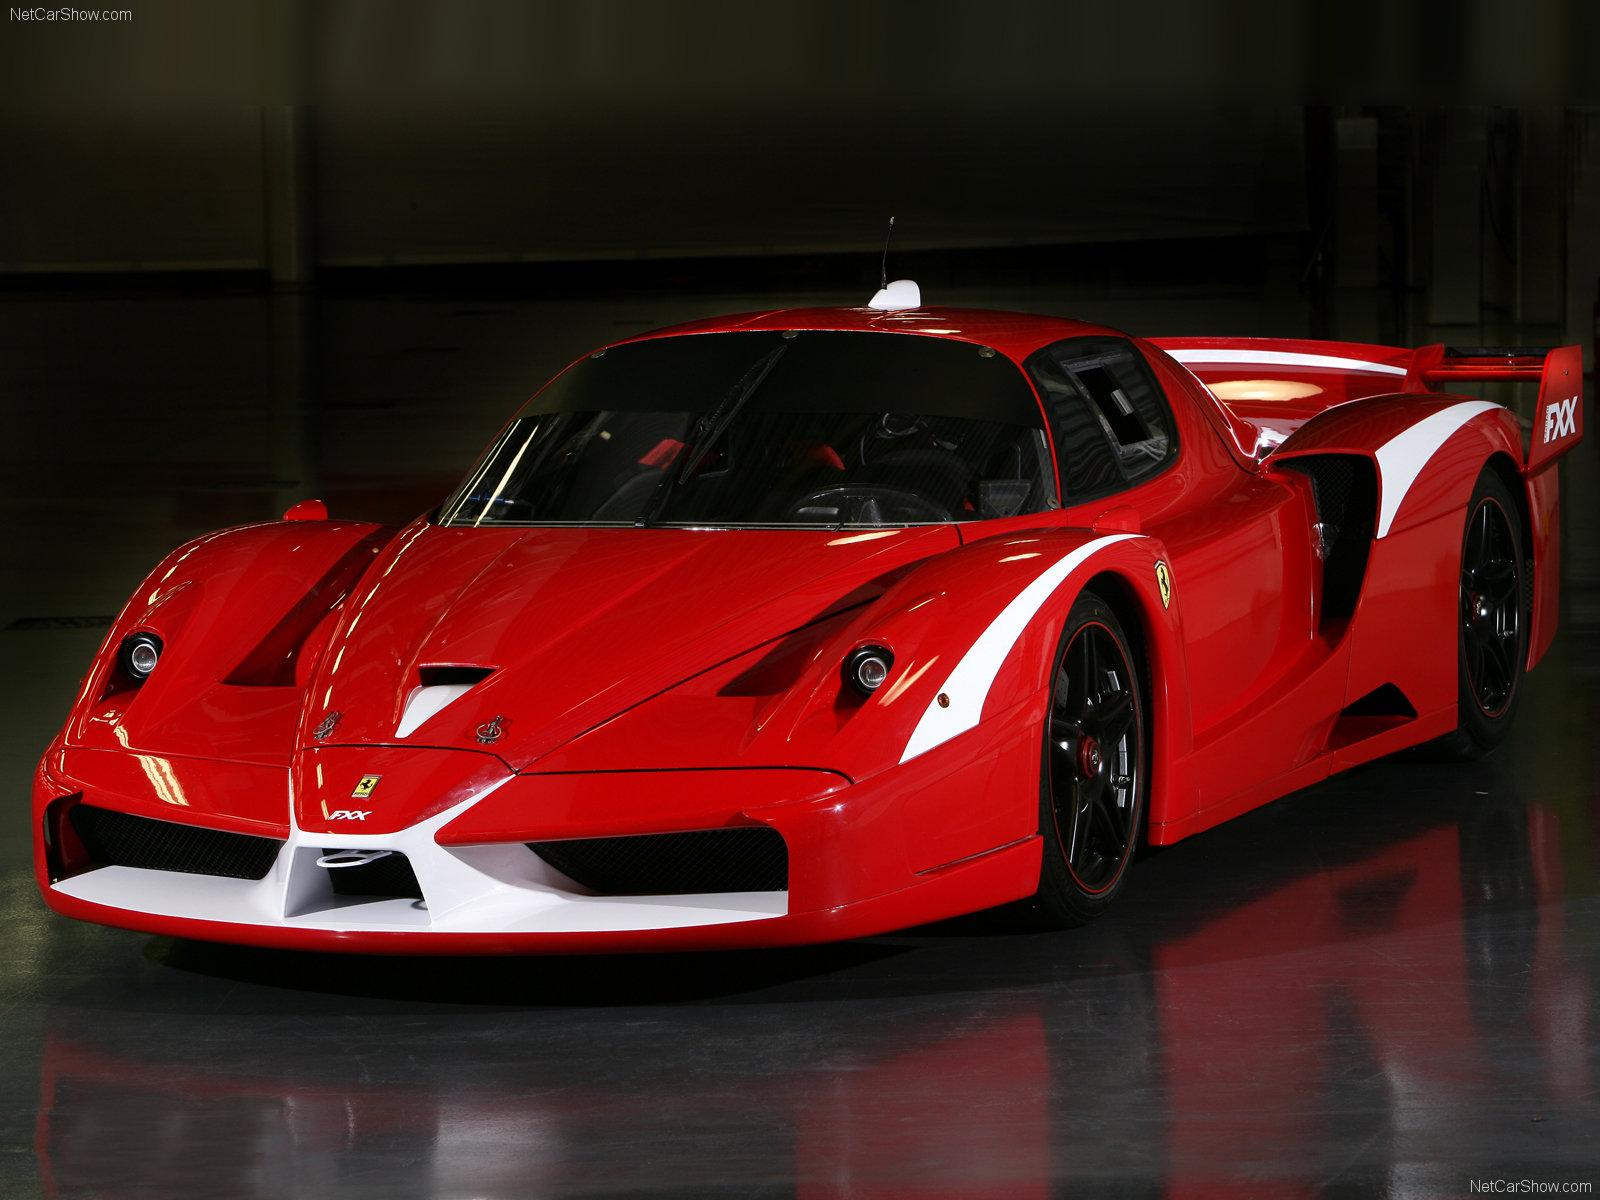 http://4.bp.blogspot.com/-zyca9GwtSq4/Tt-c_0JzL9I/AAAAAAAAAak/Zq6ZKetXie8/s1600/Ferrari-FXX_Evolution_2008_1600x1200_wallpaper_01.jpg